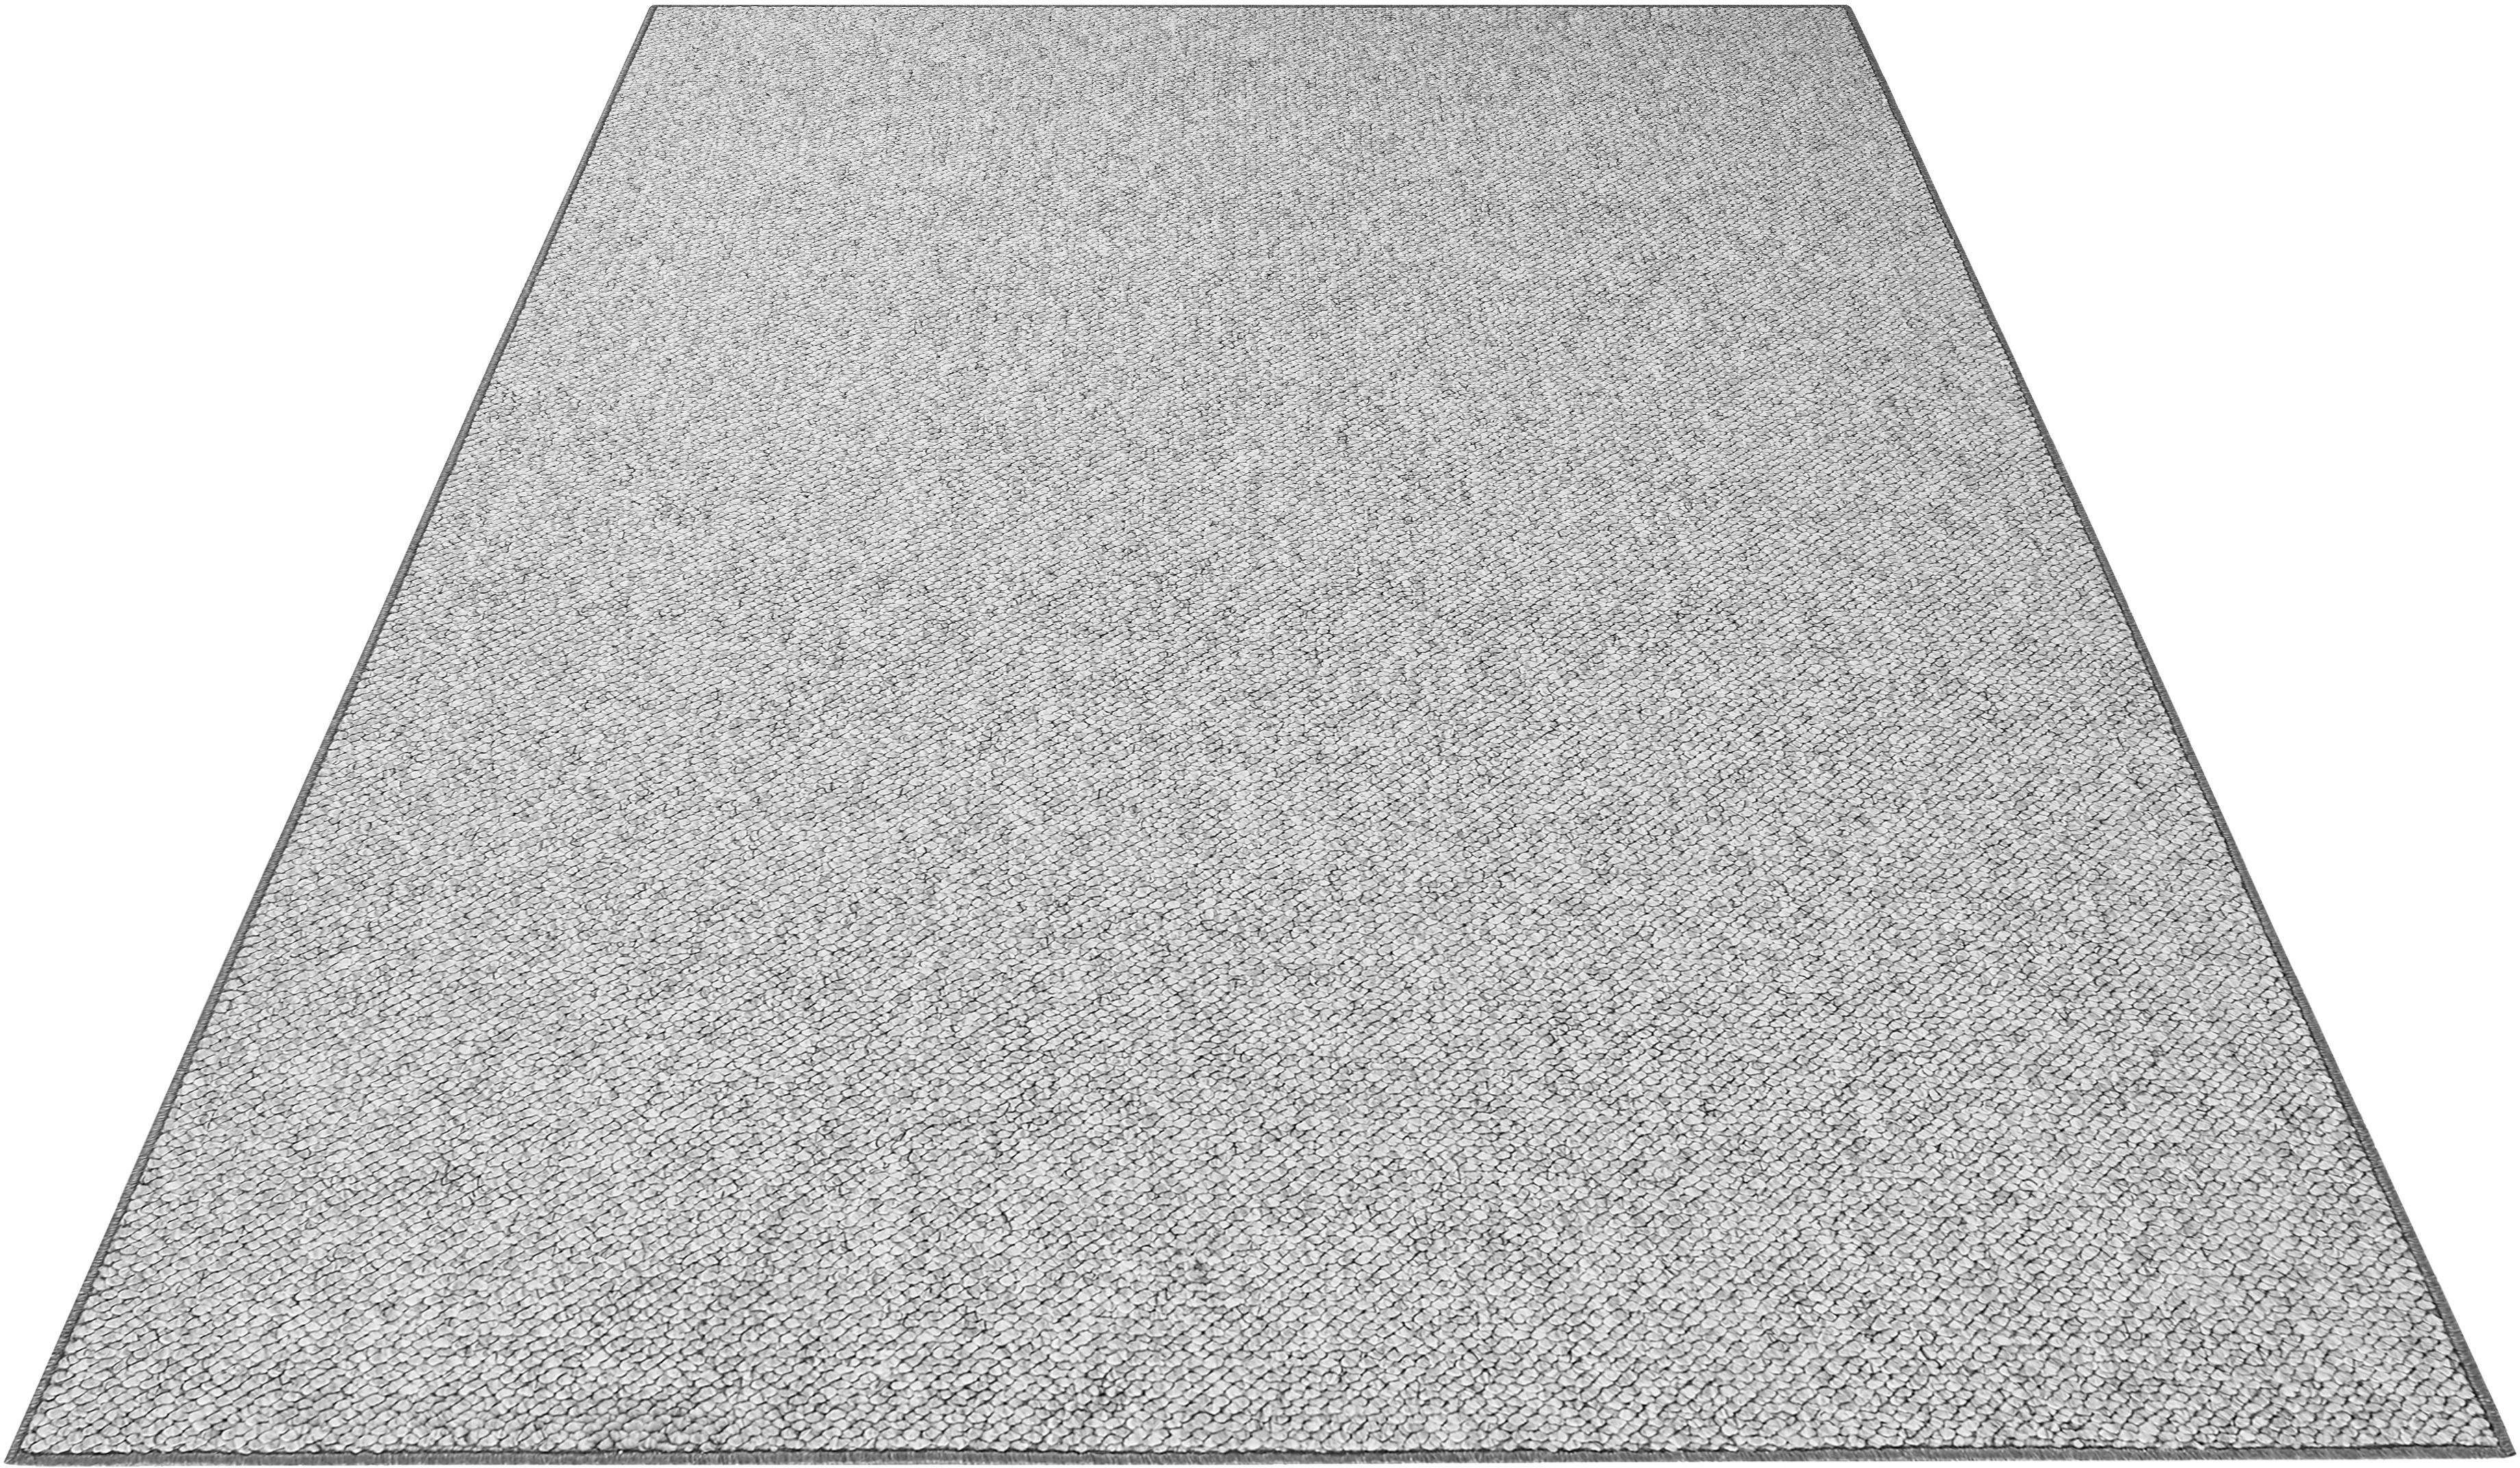 Teppich Wolly 2 BT Carpet rechteckig Höhe 12 mm maschinell getuftet